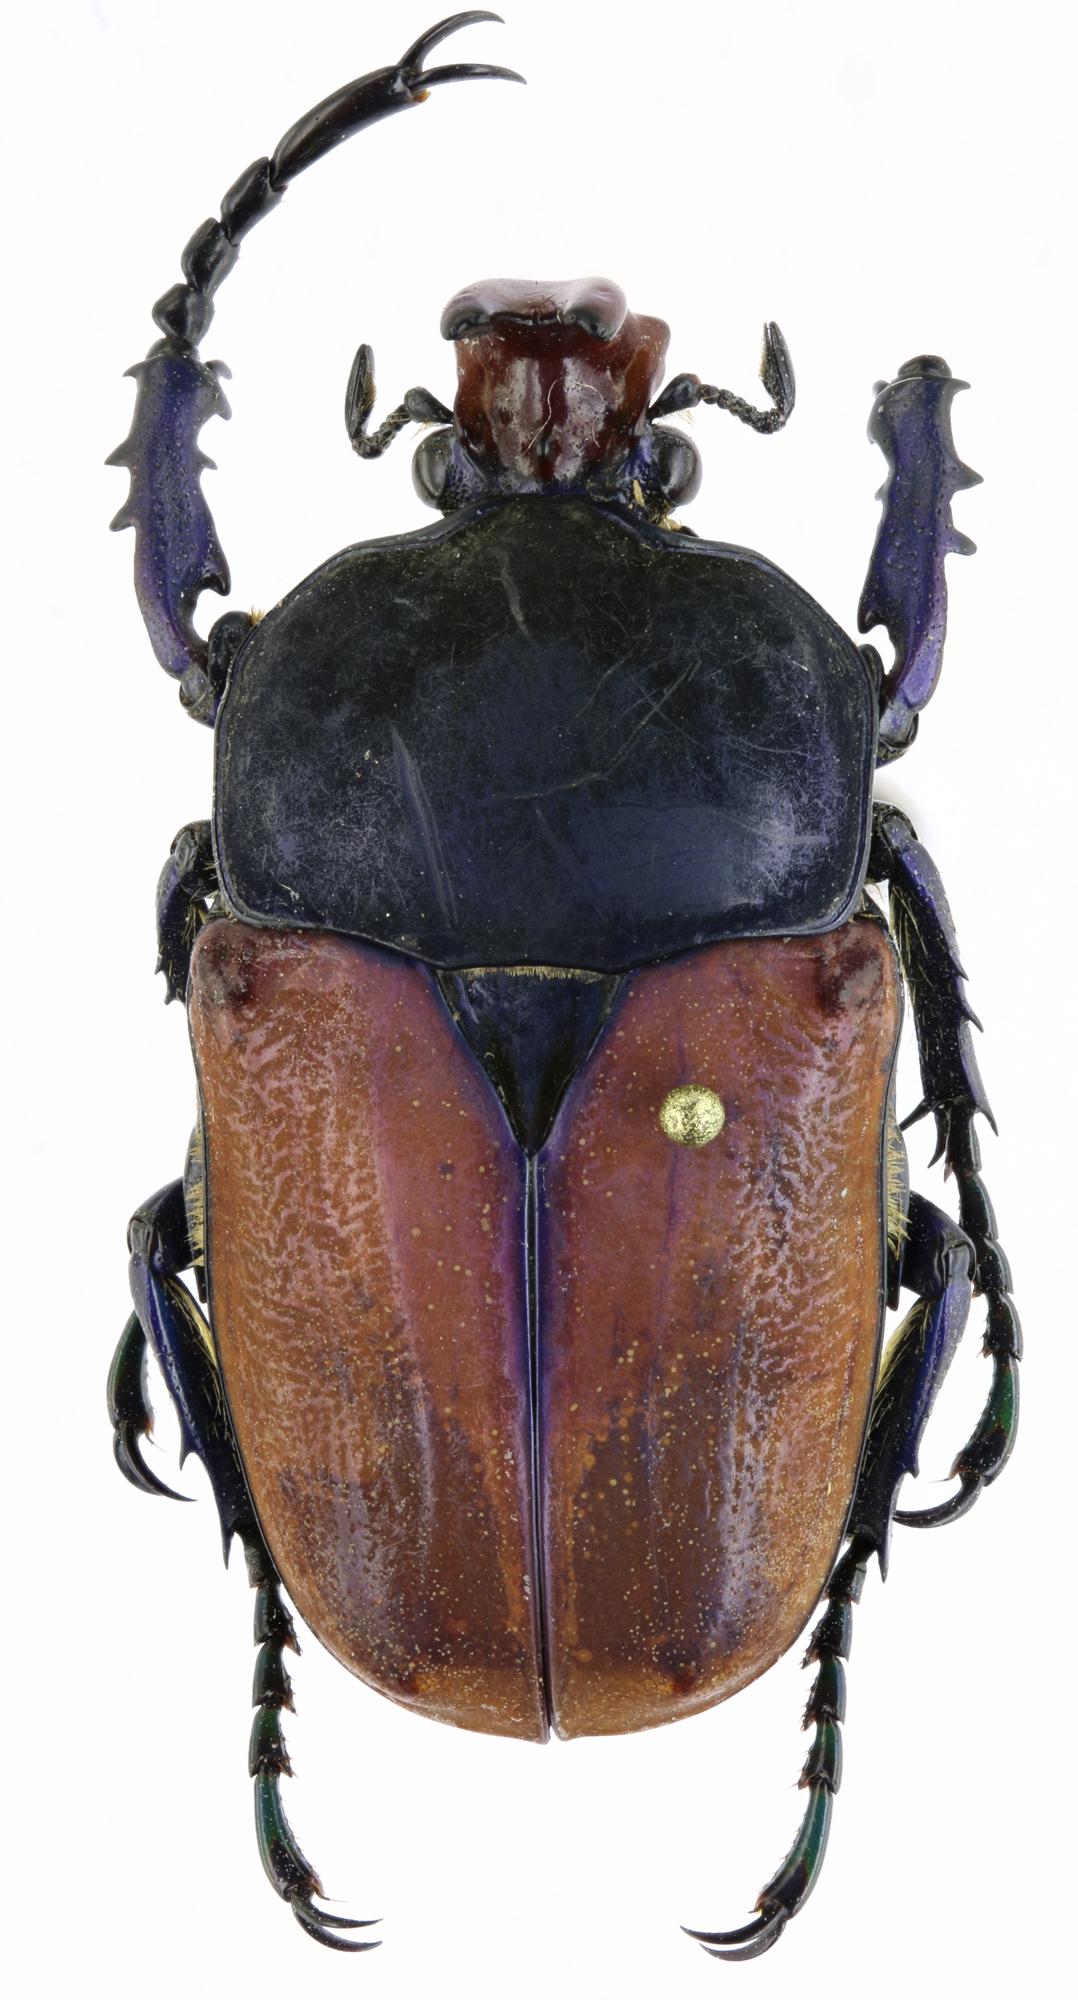 Compsocephalus horsfieldianus noguchii PT 25575zs84.jpg